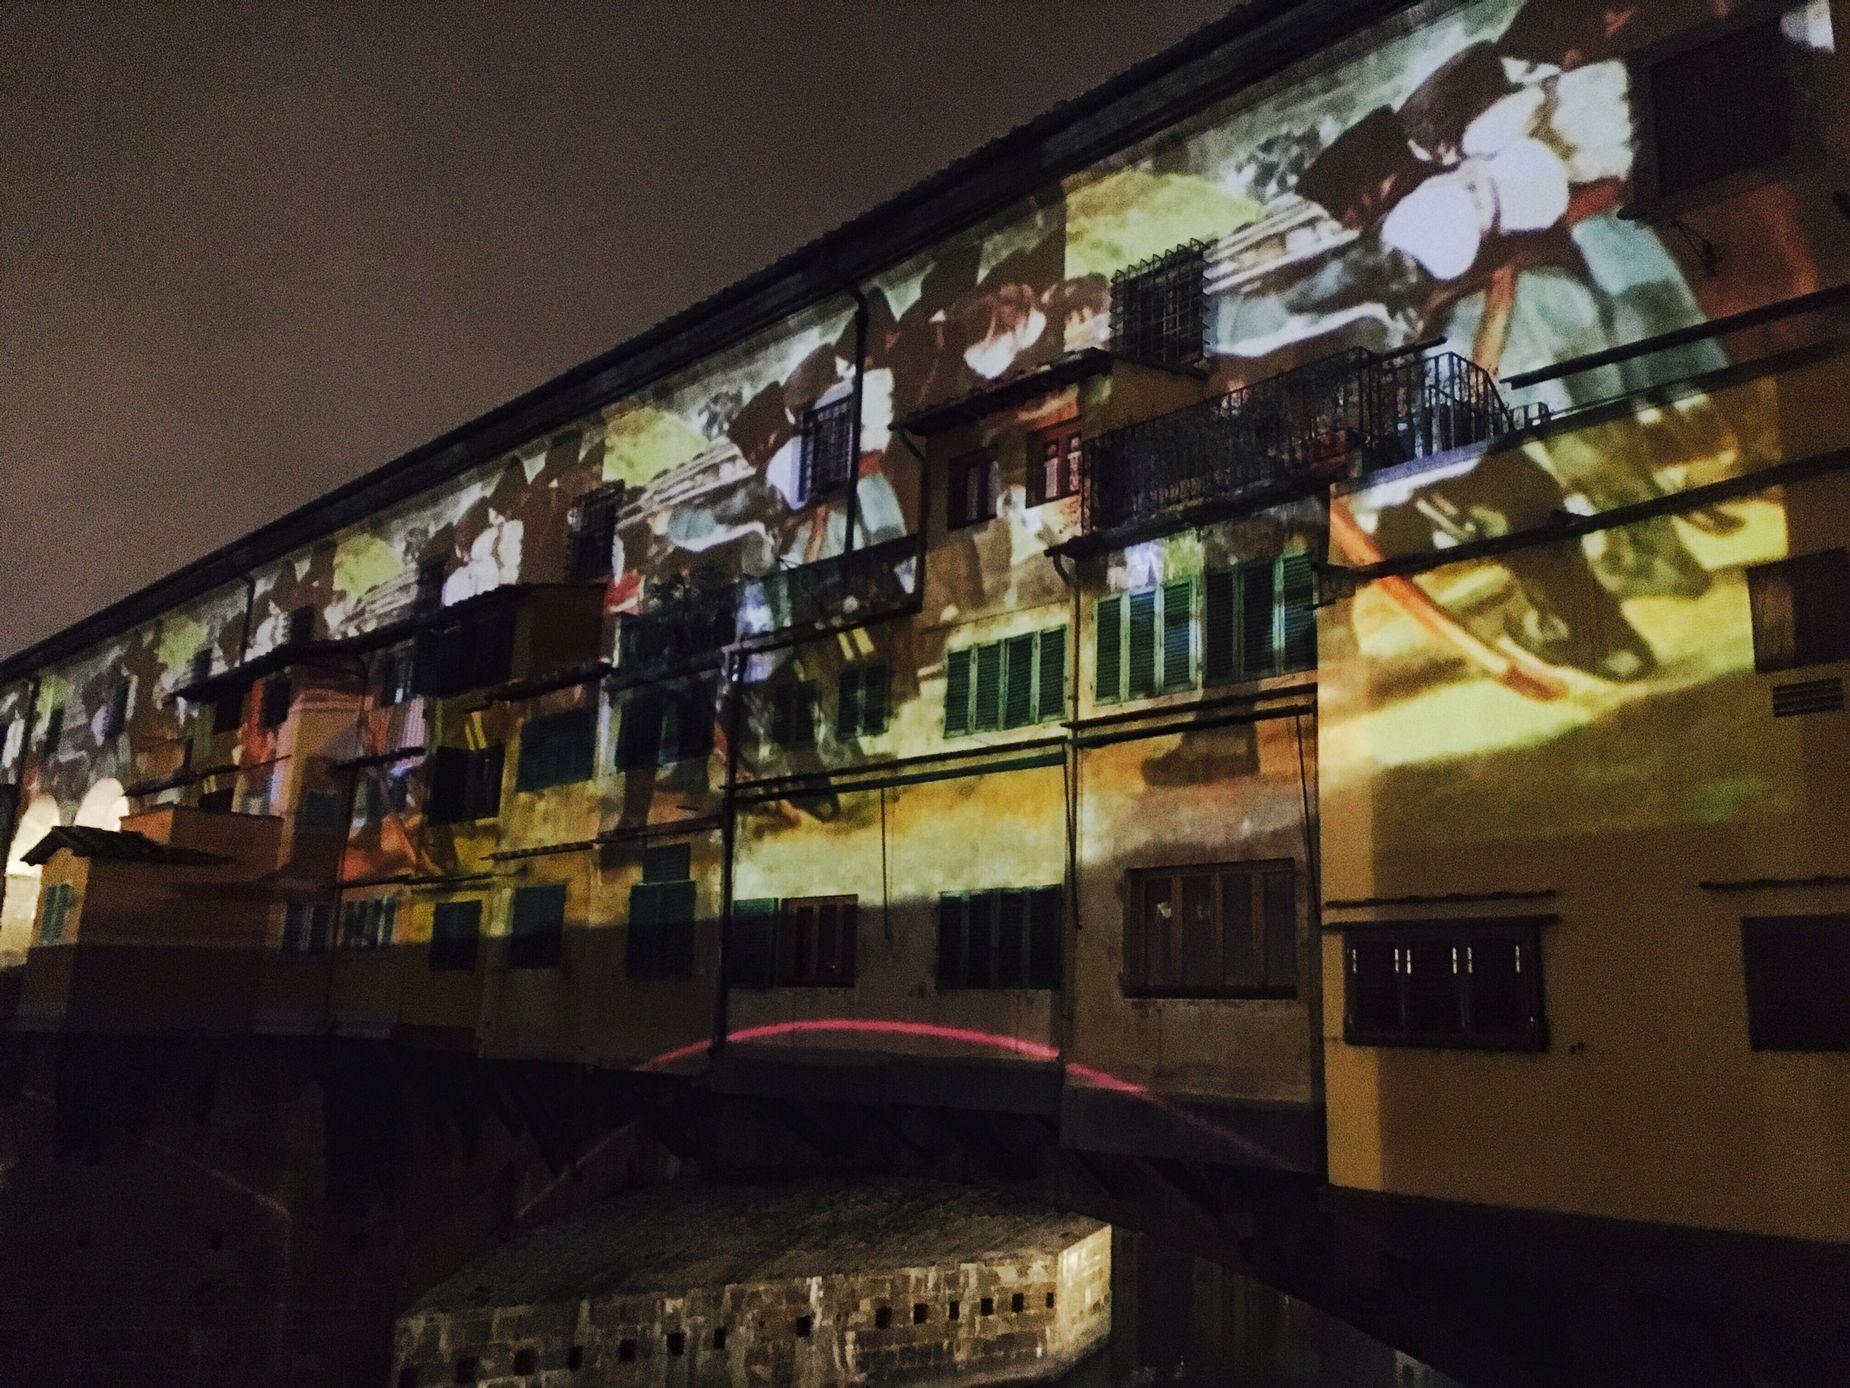 Neighborhood Map When things change they are dressed in light... PonteVecchio Florence #Firenze Italy Holidays The Street Photographer - 2017 EyeEm Awards Artinweb Outdoors Artinwebbyjbh Web Artbyjbh Webart #artbyjbh Artbyjbh